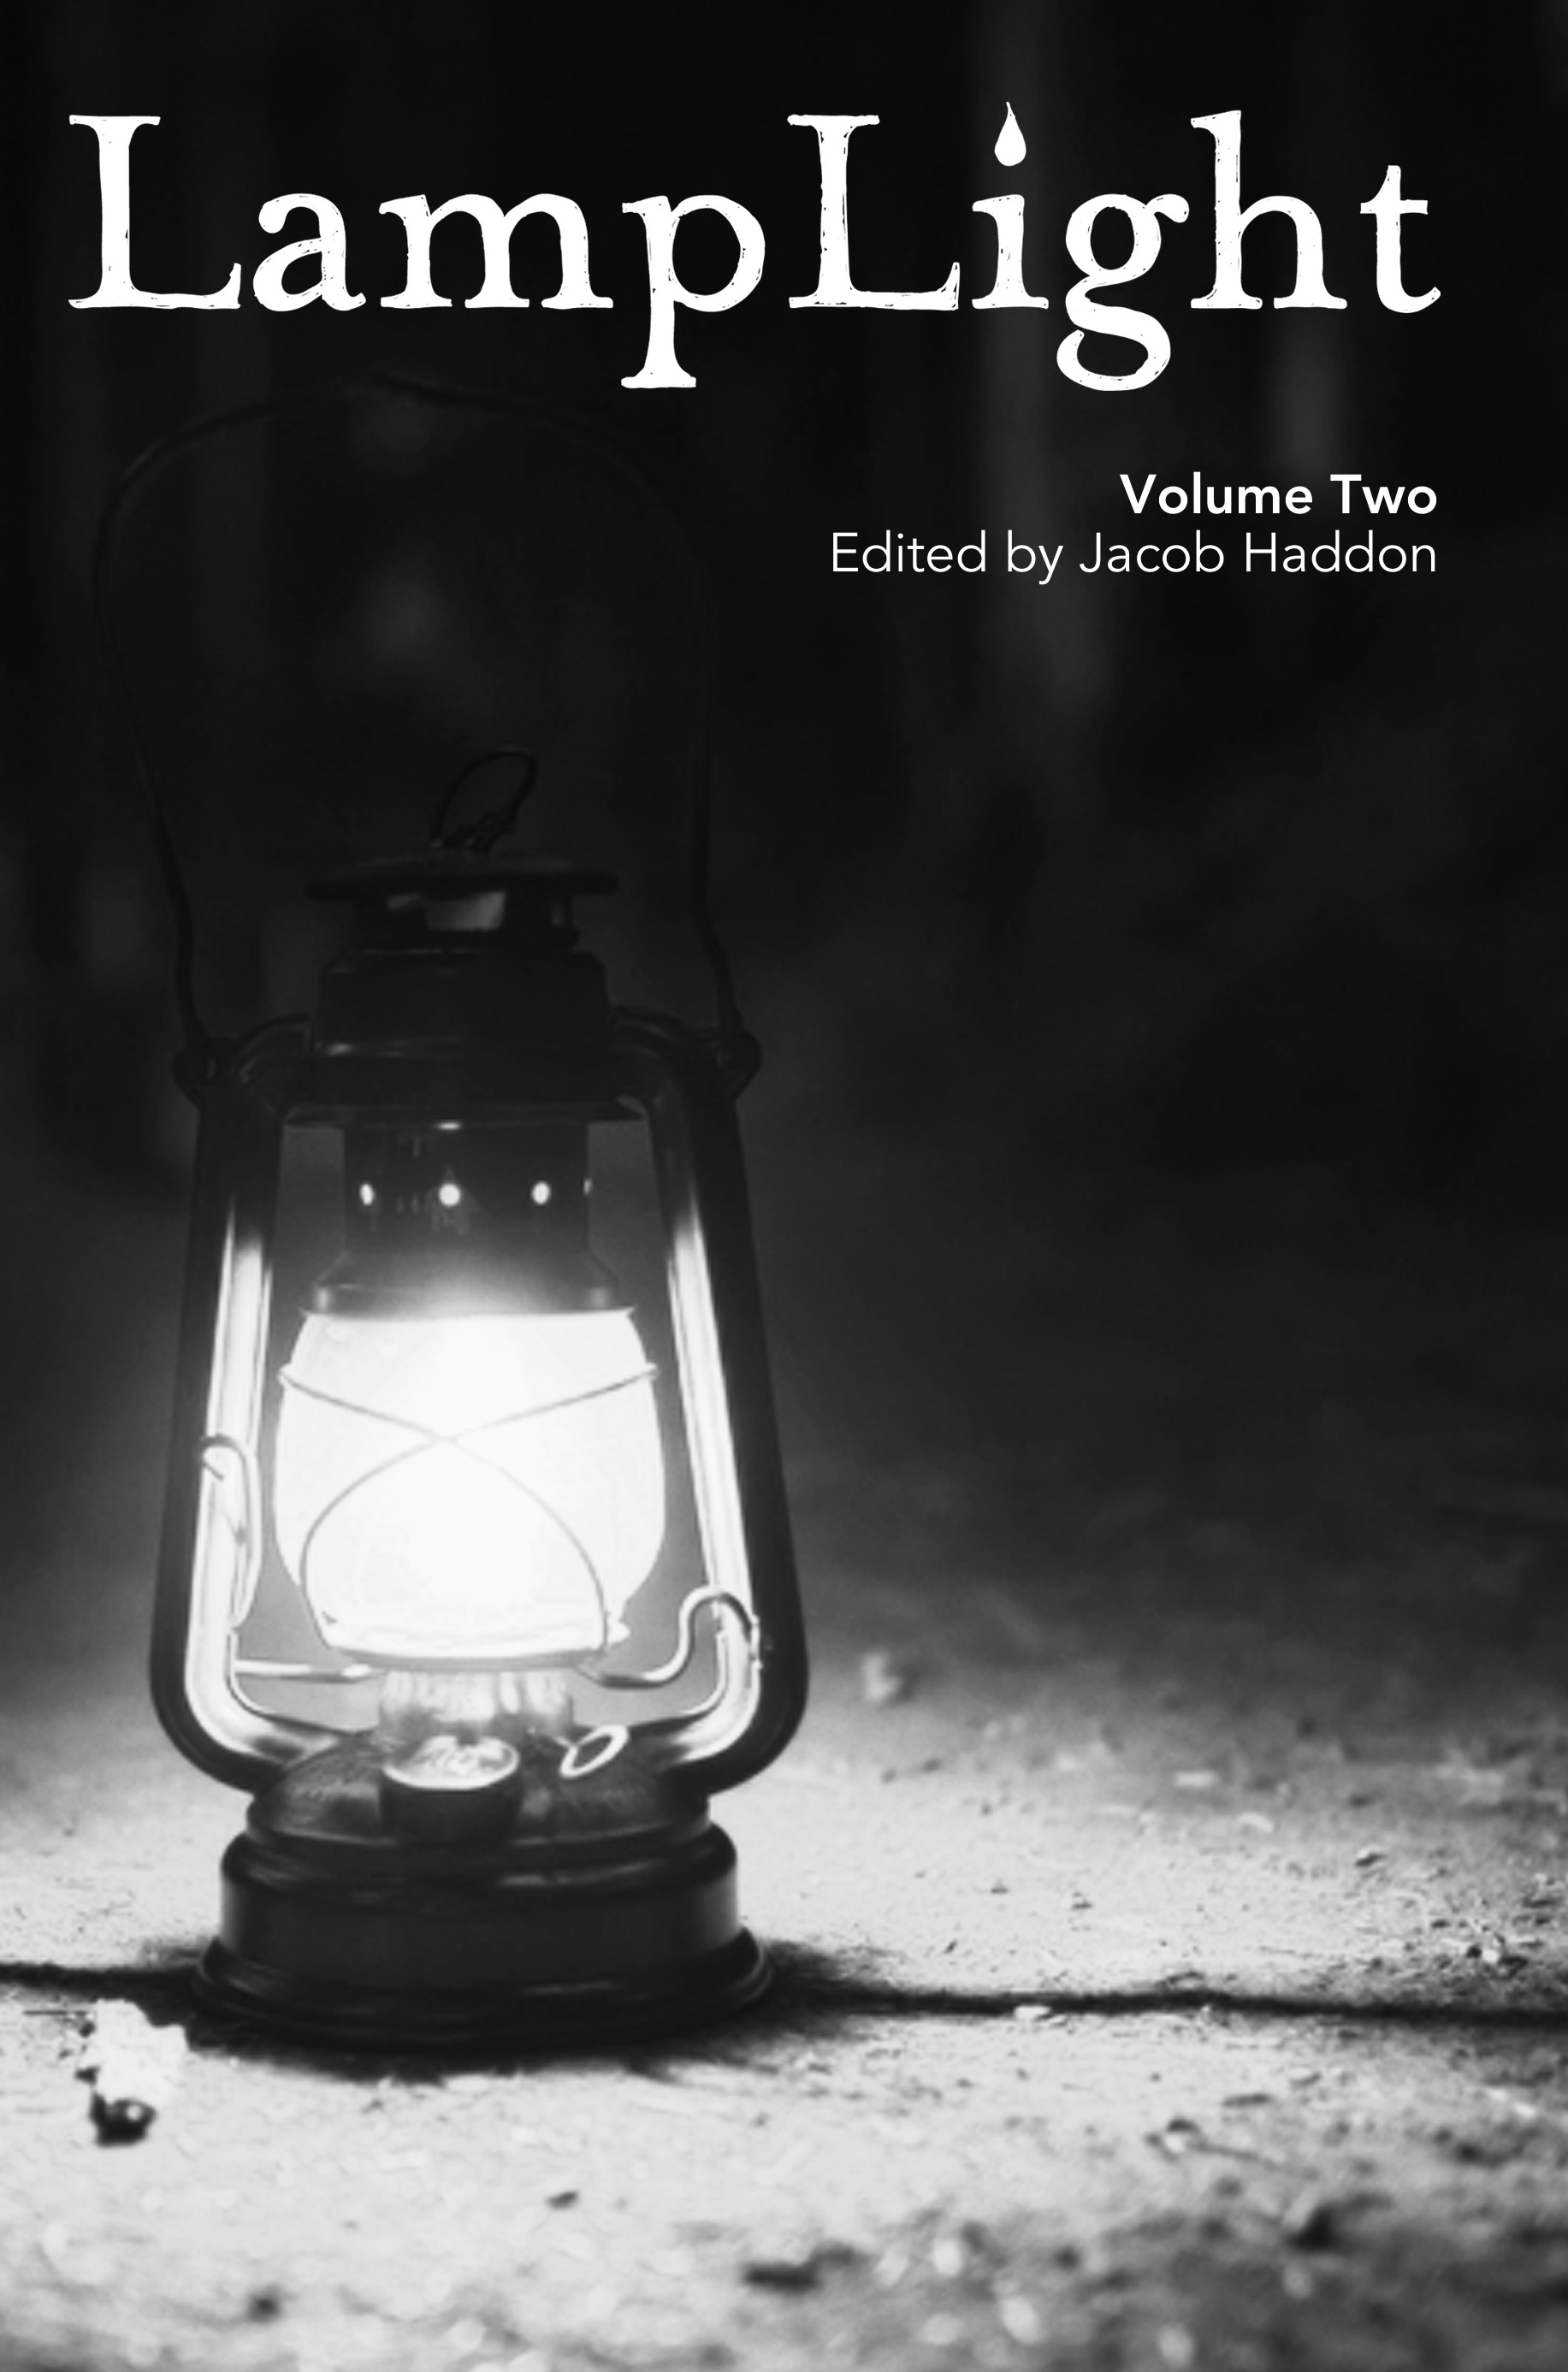 LampLight Volume 2